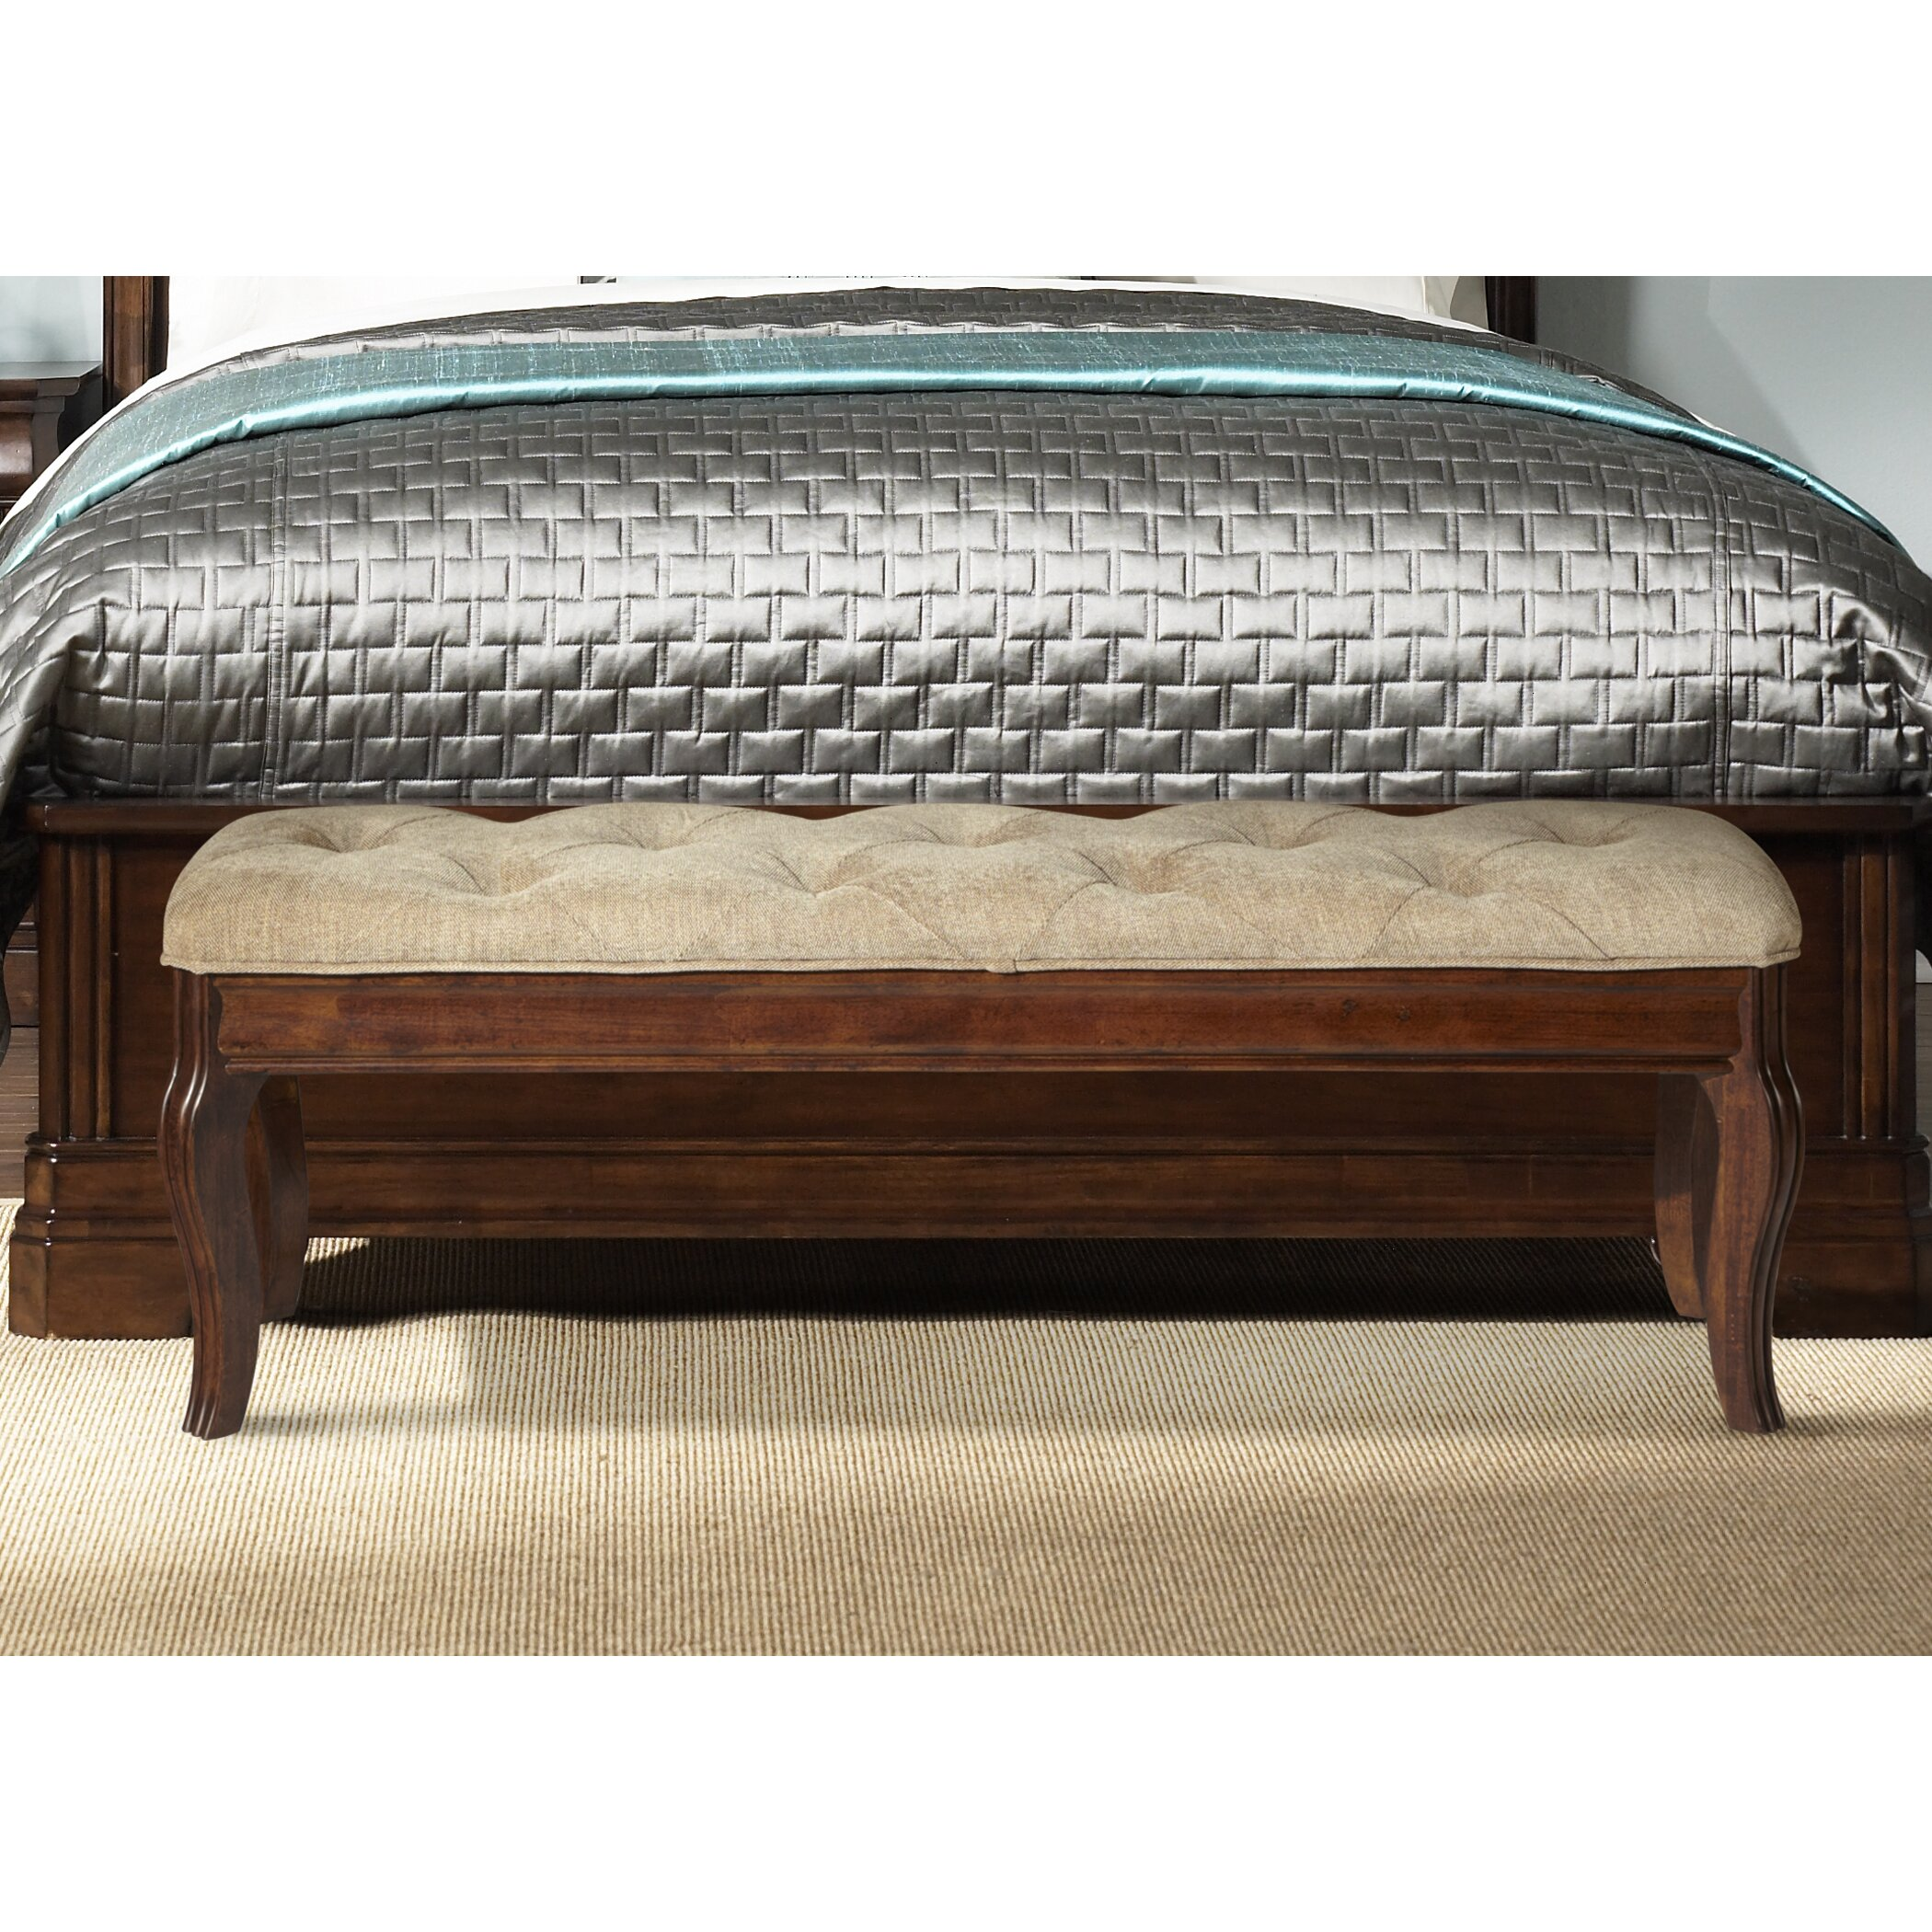 Varian Upholstered Storage Bedroom Bench Birchlane: Rosalind Wheeler Ruppert Upholstered Bedroom Bench